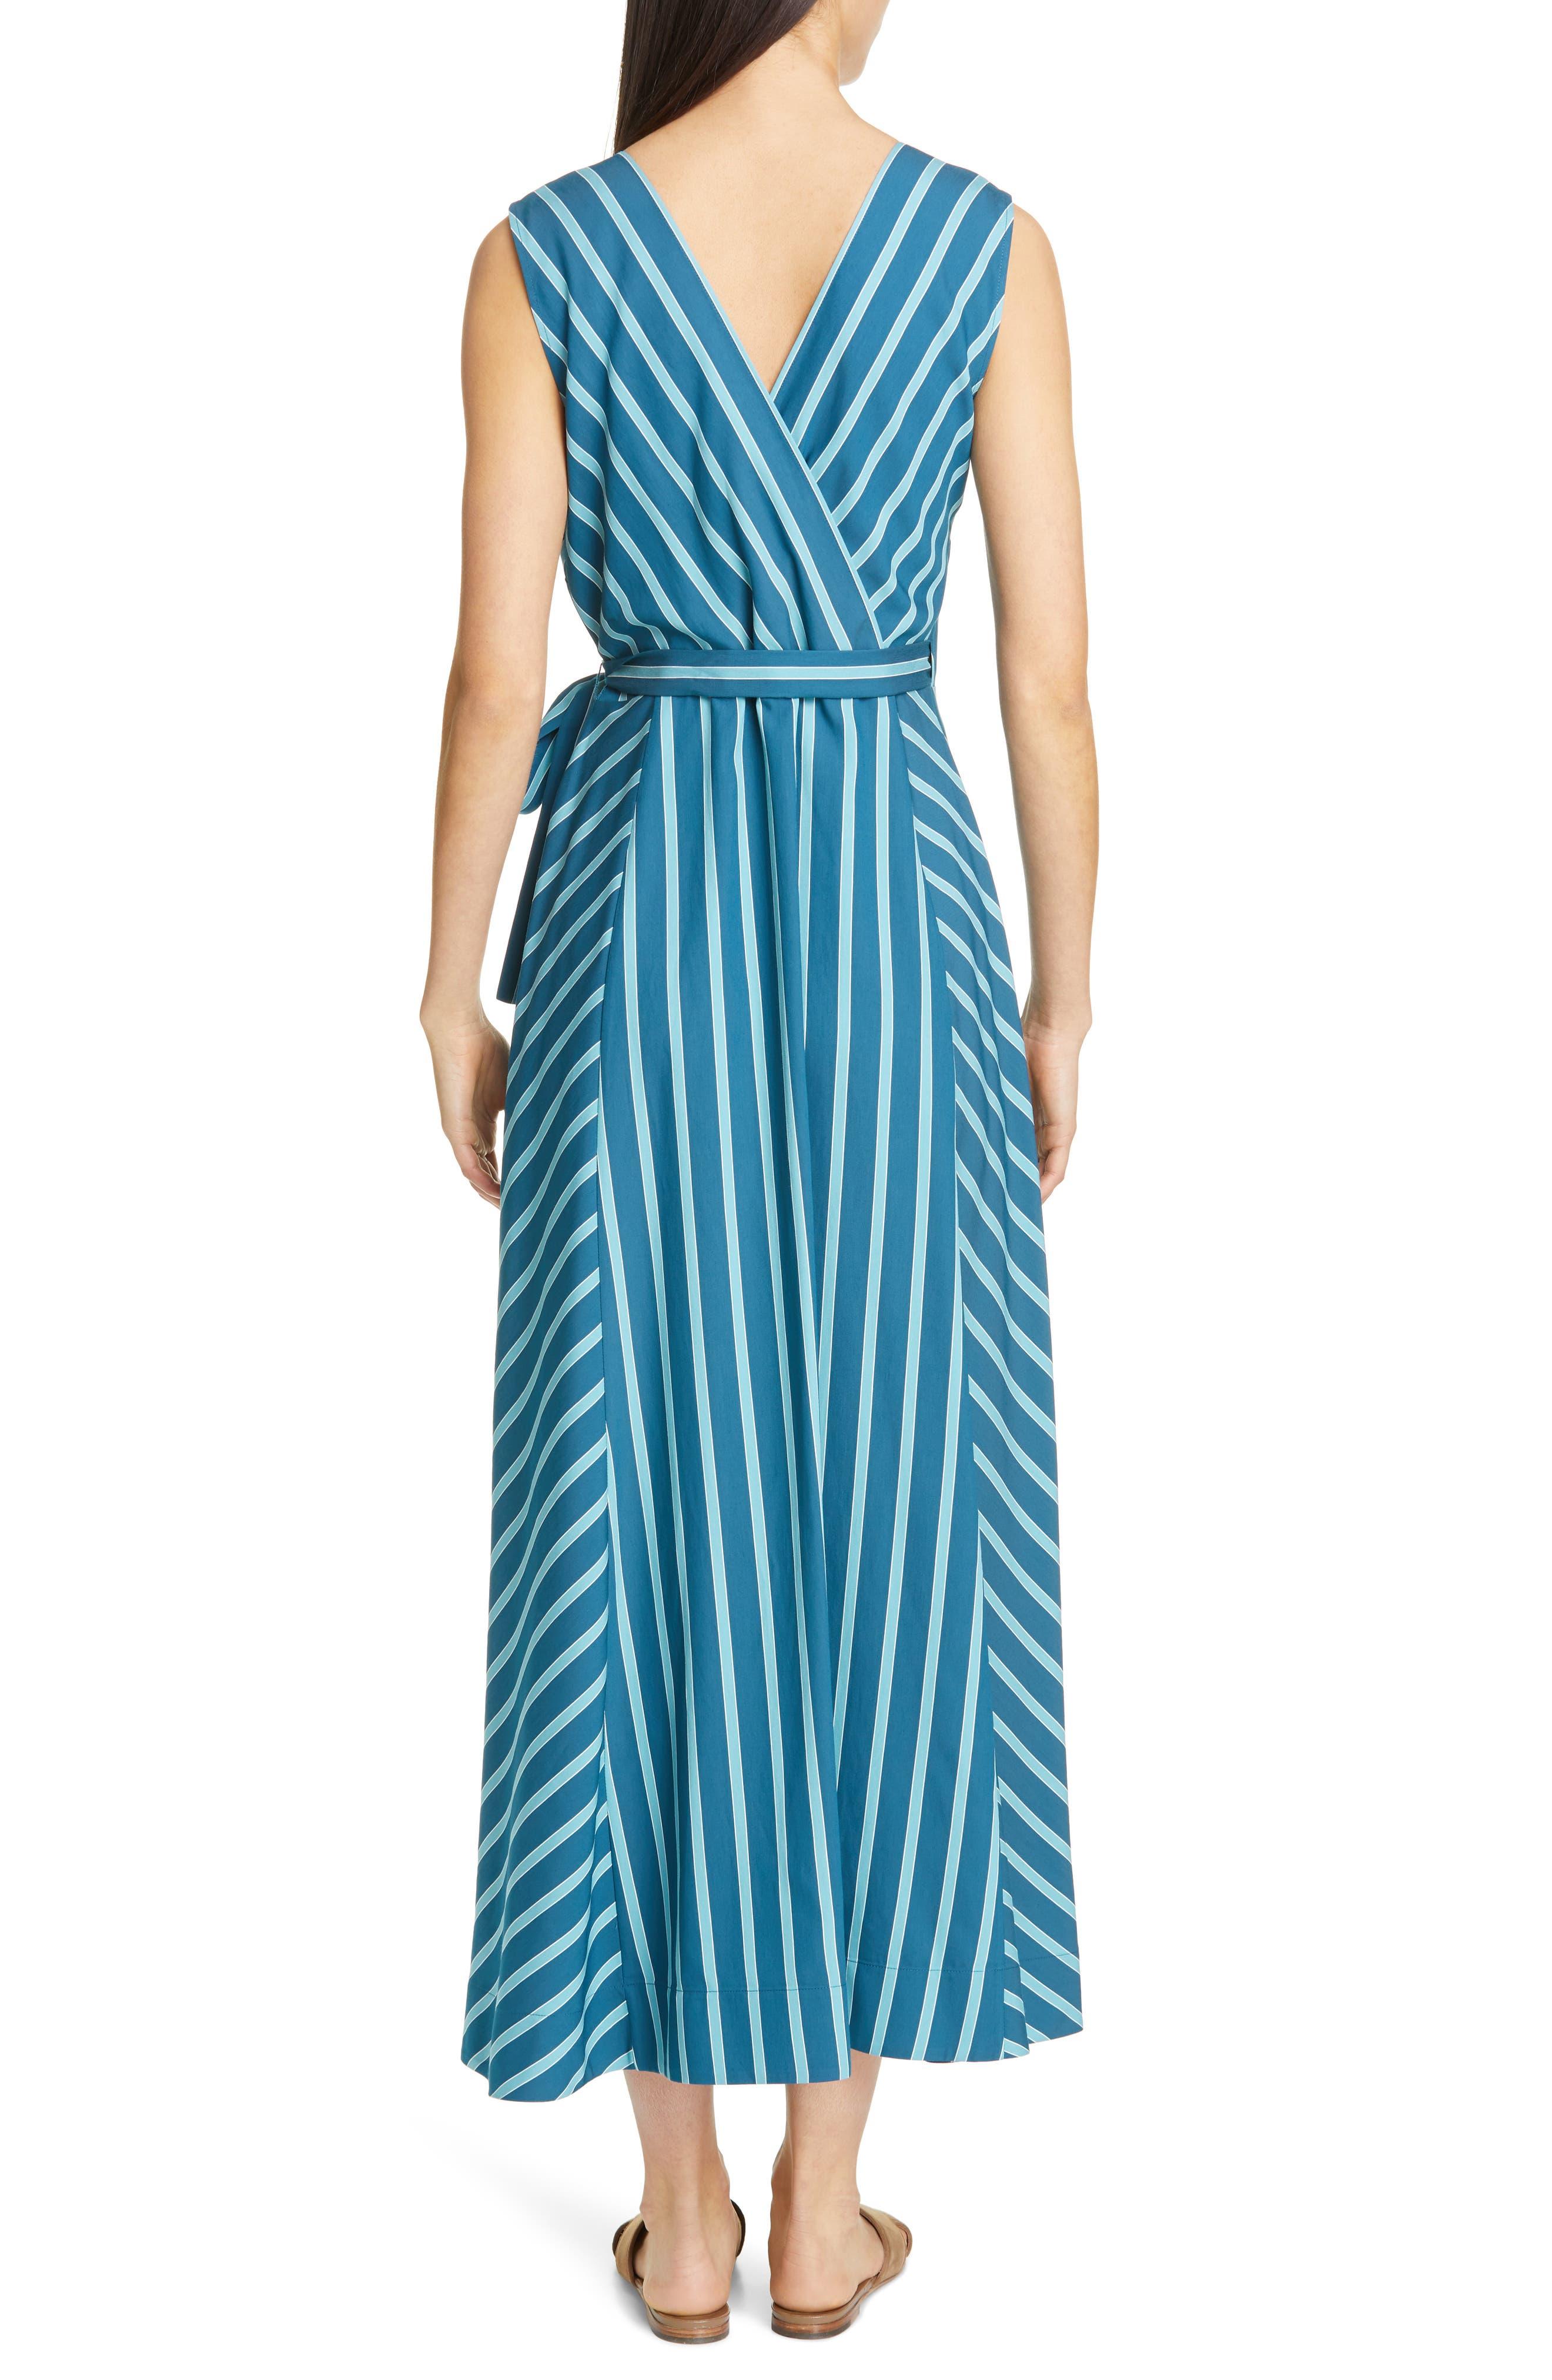 LAFAYETTE 148 NEW YORK, Siri Wrap Dress, Alternate thumbnail 2, color, PACIFIC MULTI